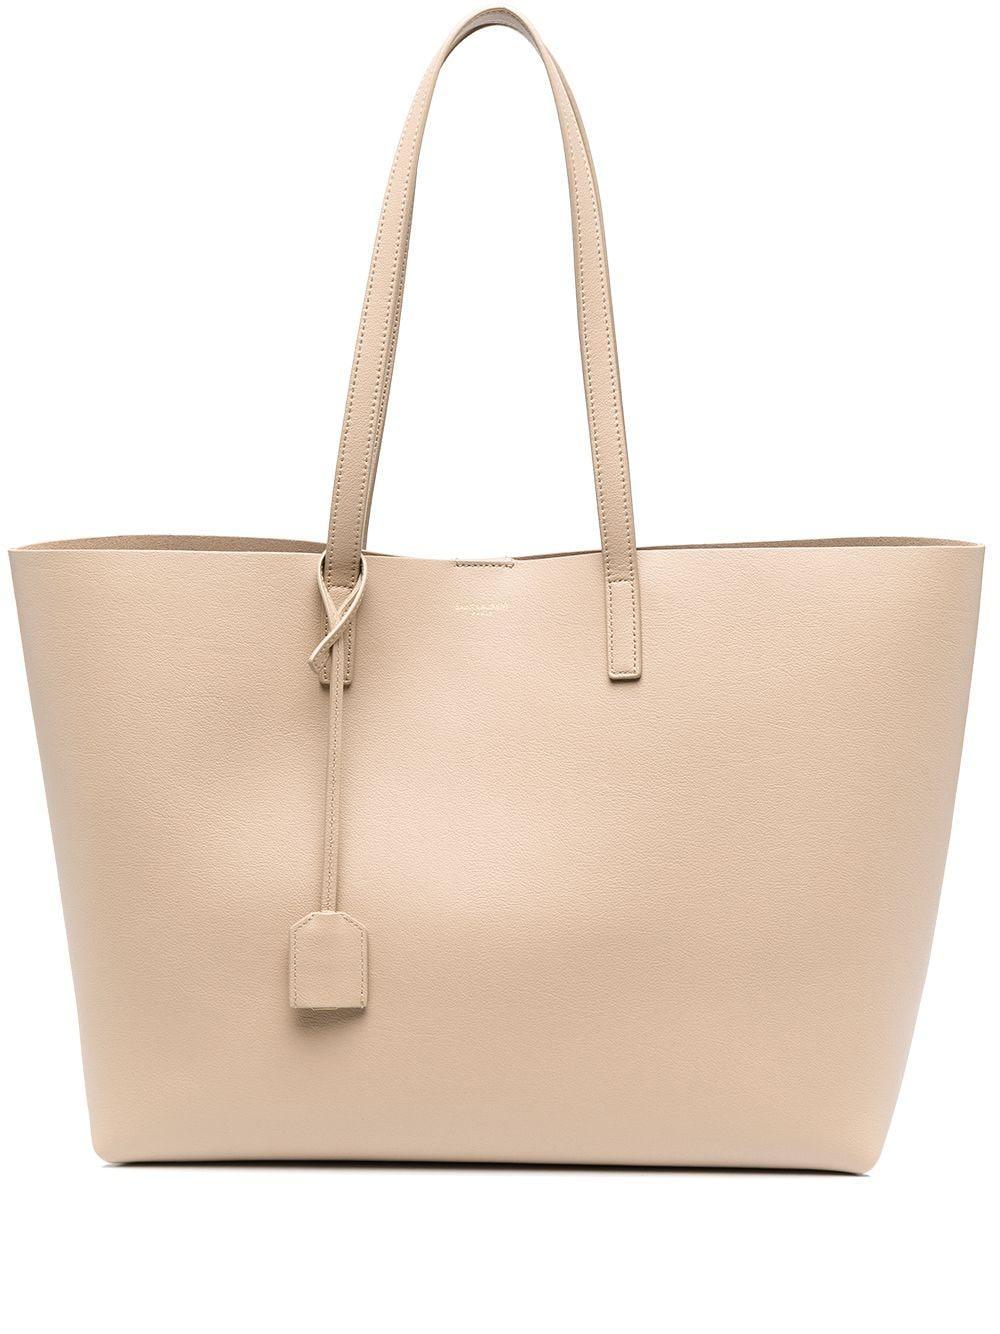 Logo Shopping Tote Bag Item # 600281CSV0J-F21